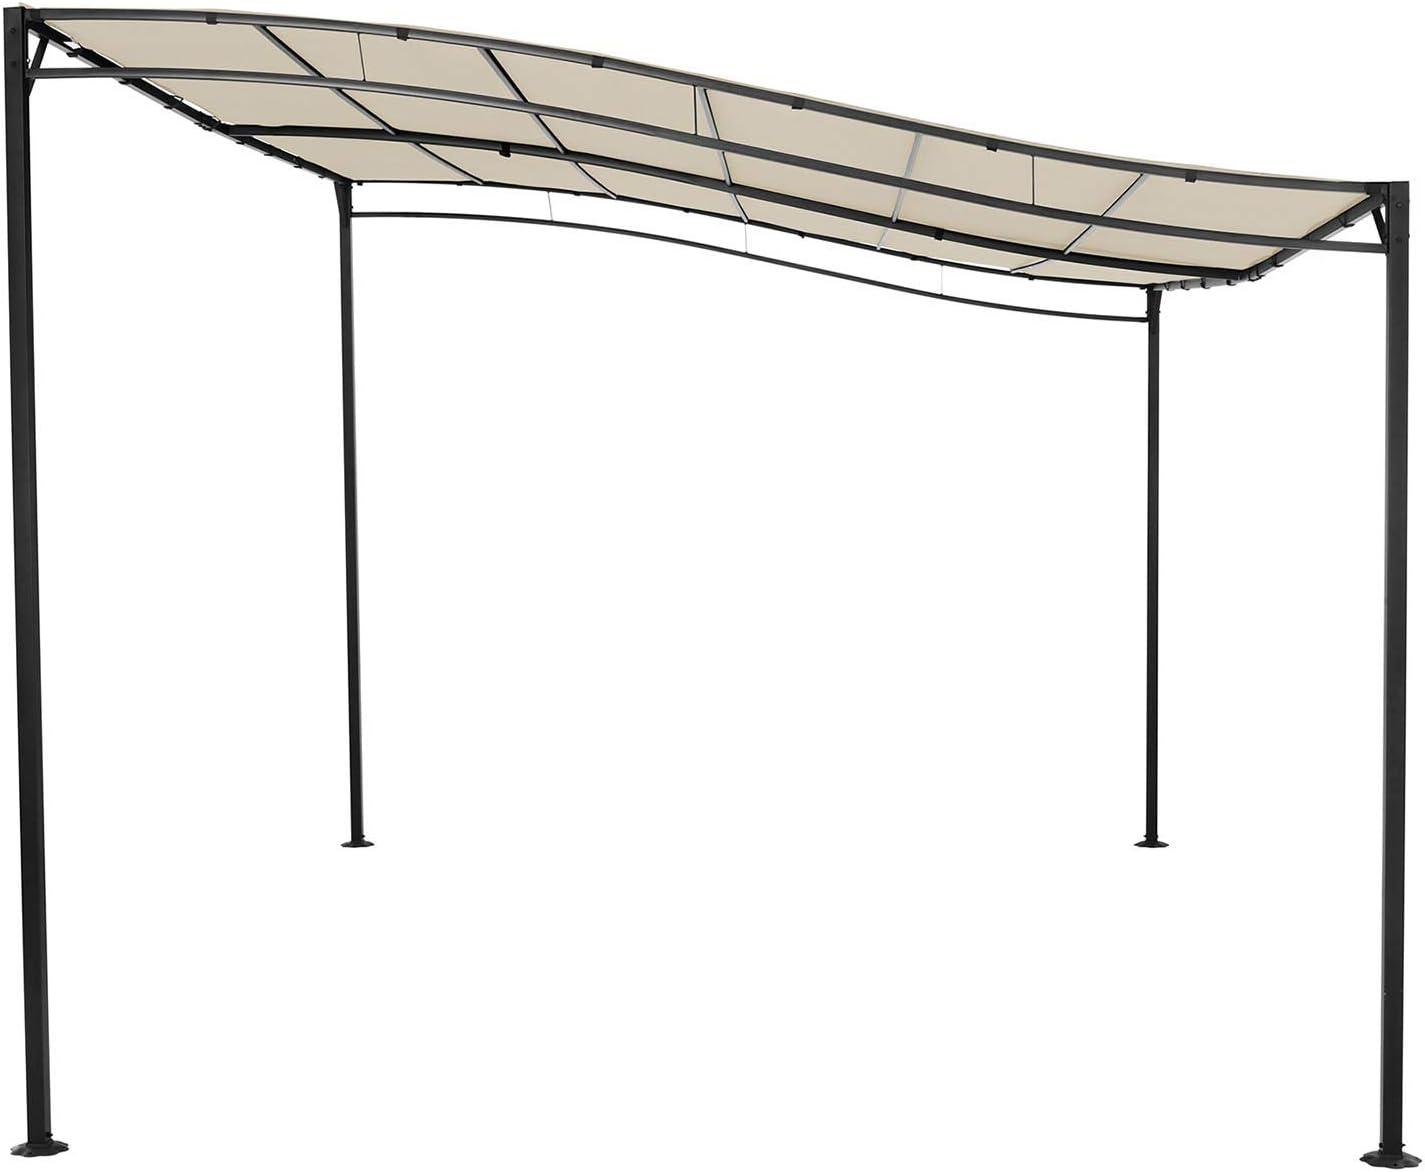 Uniprodo Pérgola De Metal Pabellón para Terraza Uni_Gazebo_3X4B (Toldo de 3 x 4 m, 180 g/m², Altura Total: 2, 40 m, Color Crema): Amazon.es: Jardín